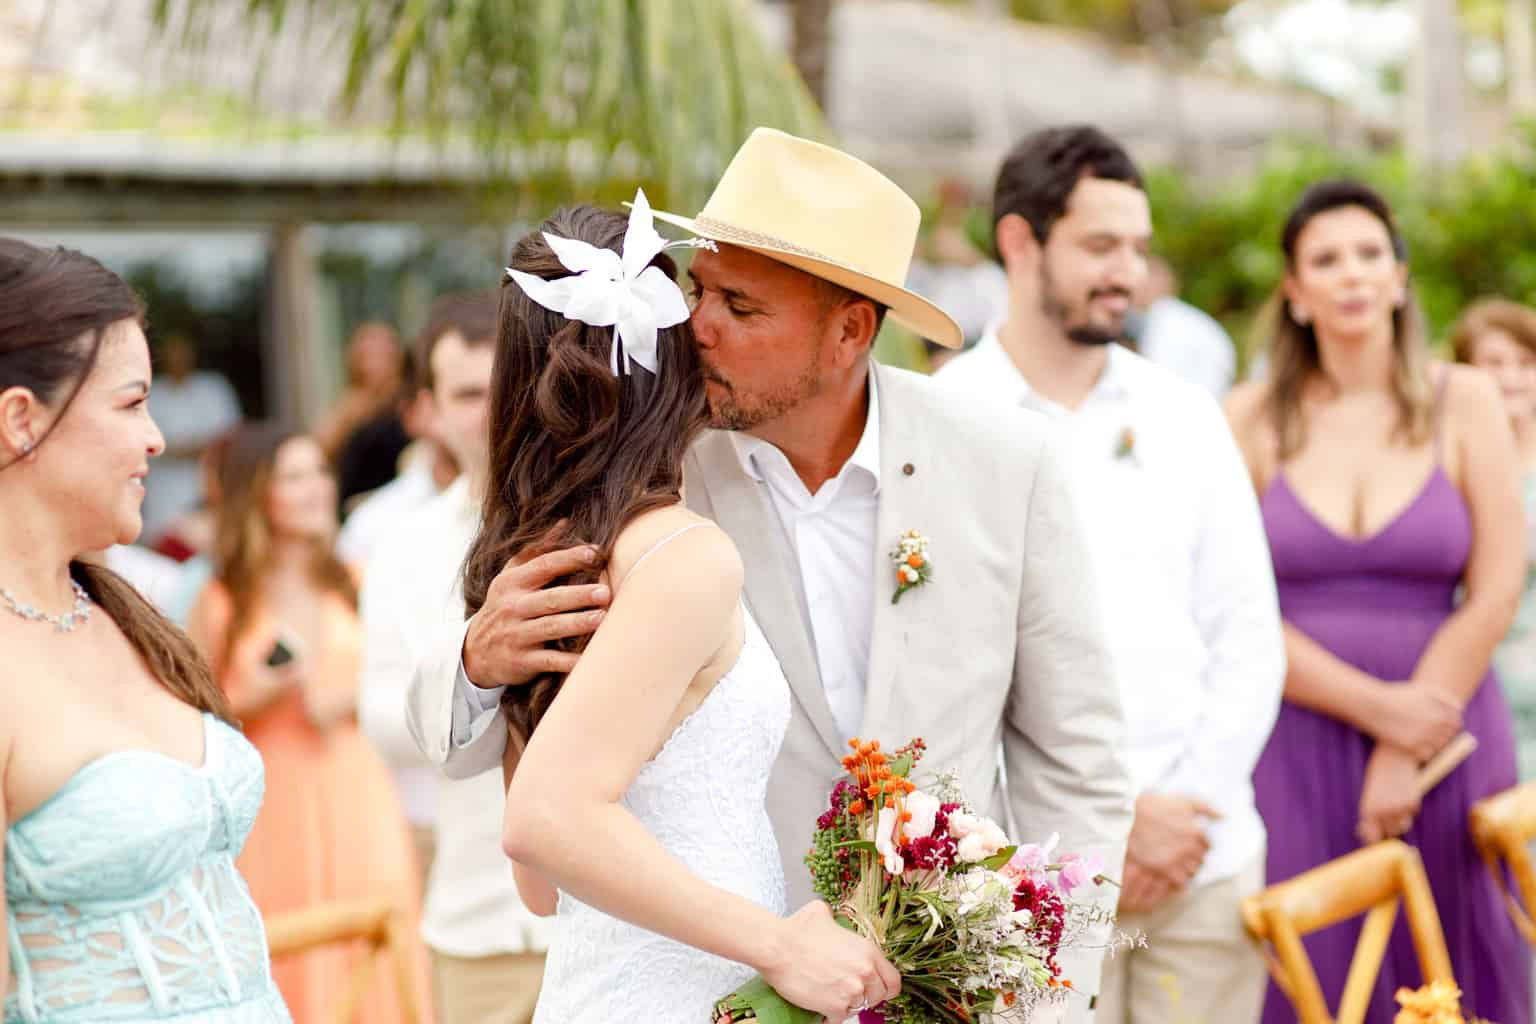 Casamento-Emanuelle-e-Alysson-Fotografia-Tadeu-Nanó-e-Luca-Antunes76